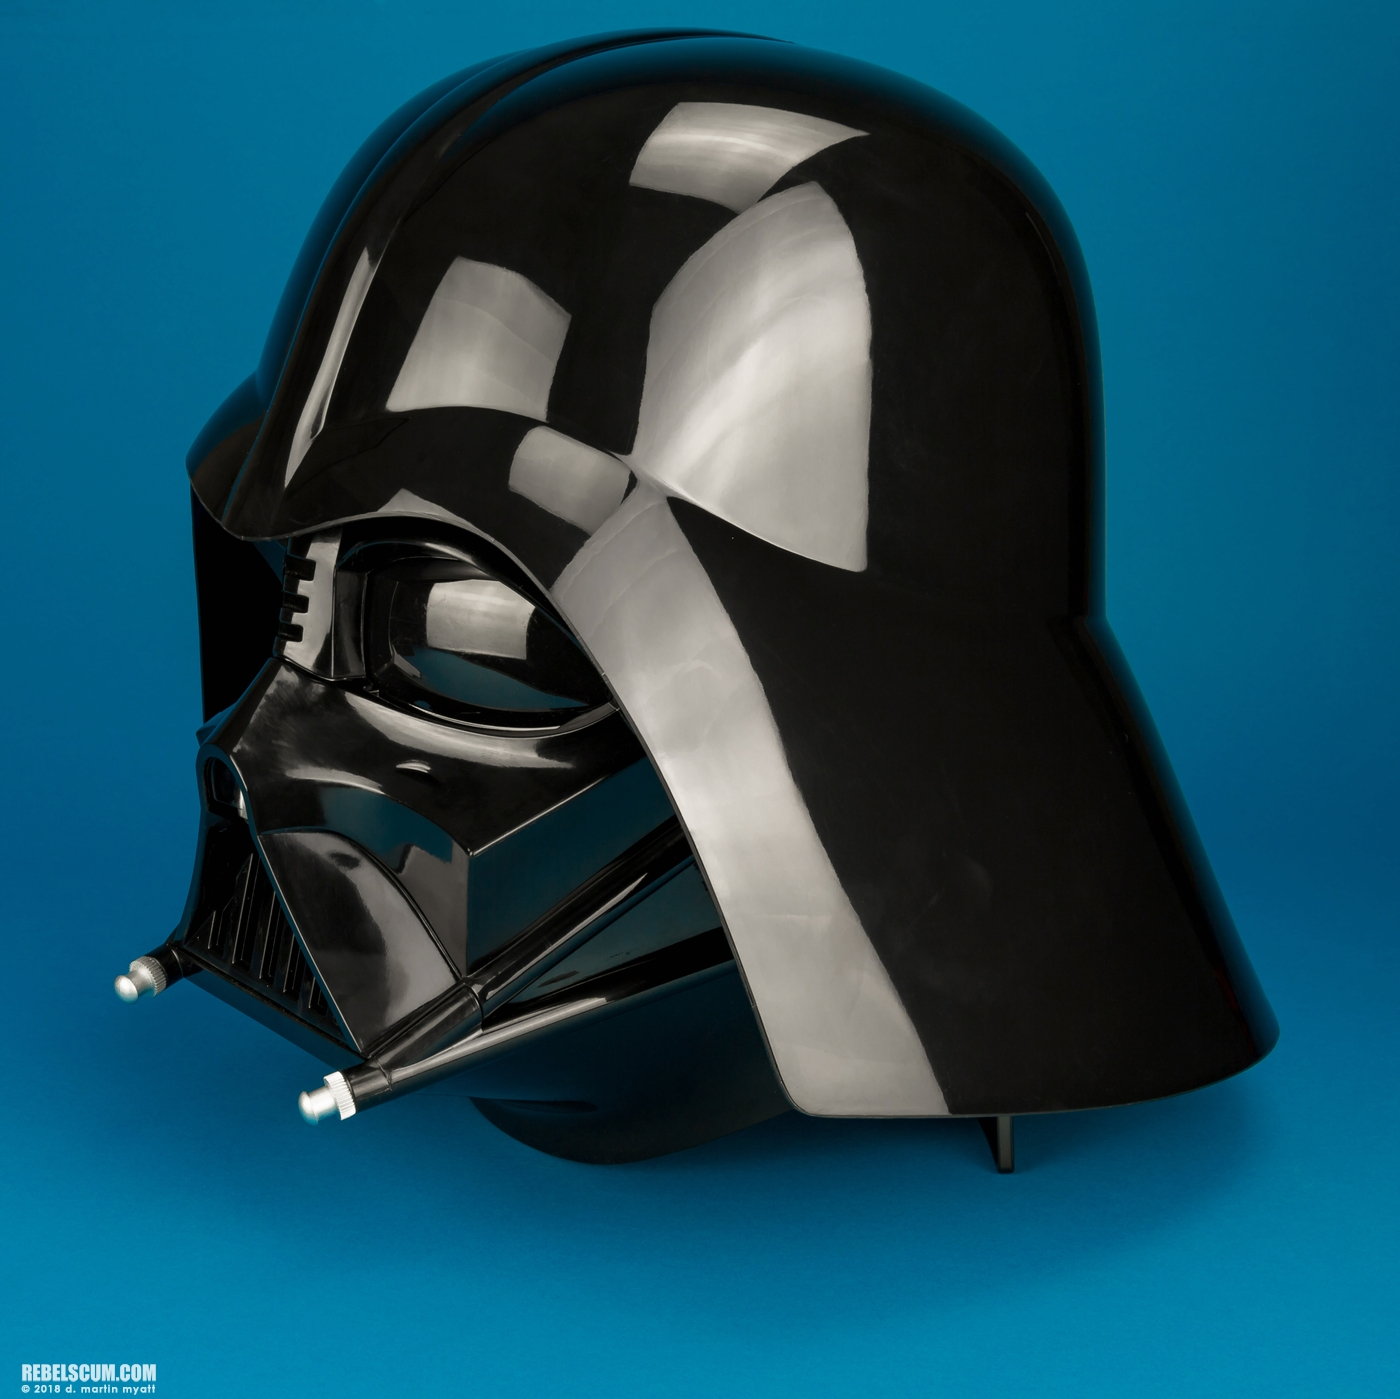 Star Wars Black Series Darth Vader Premium Electronic Helmet